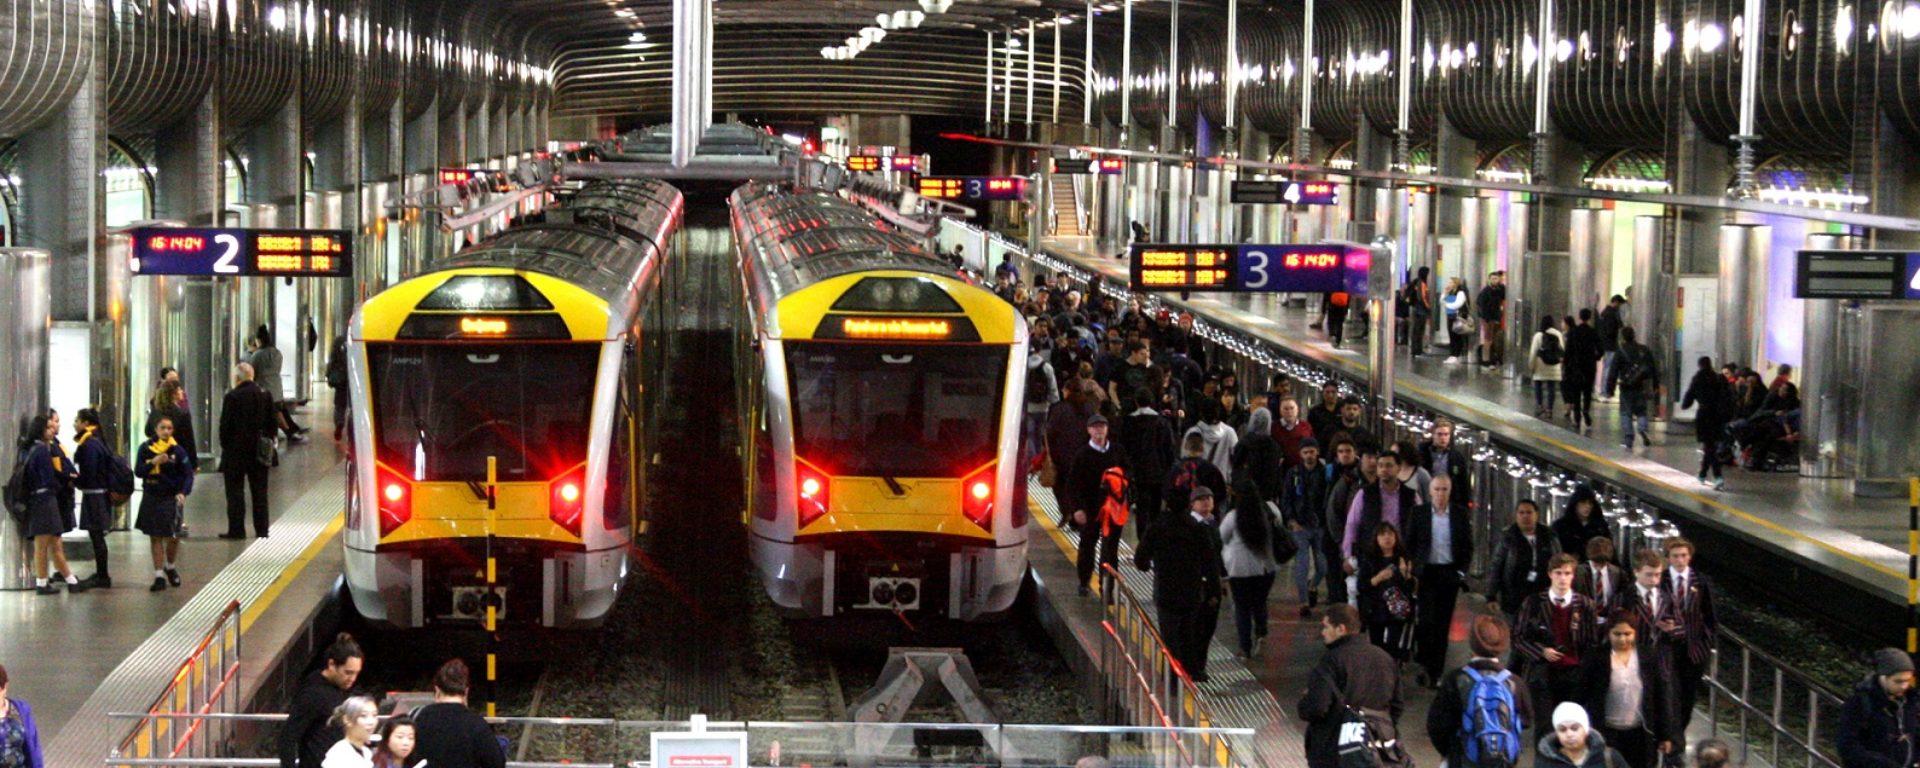 Transdev Group Auckland Train rail passengers passager mobility company